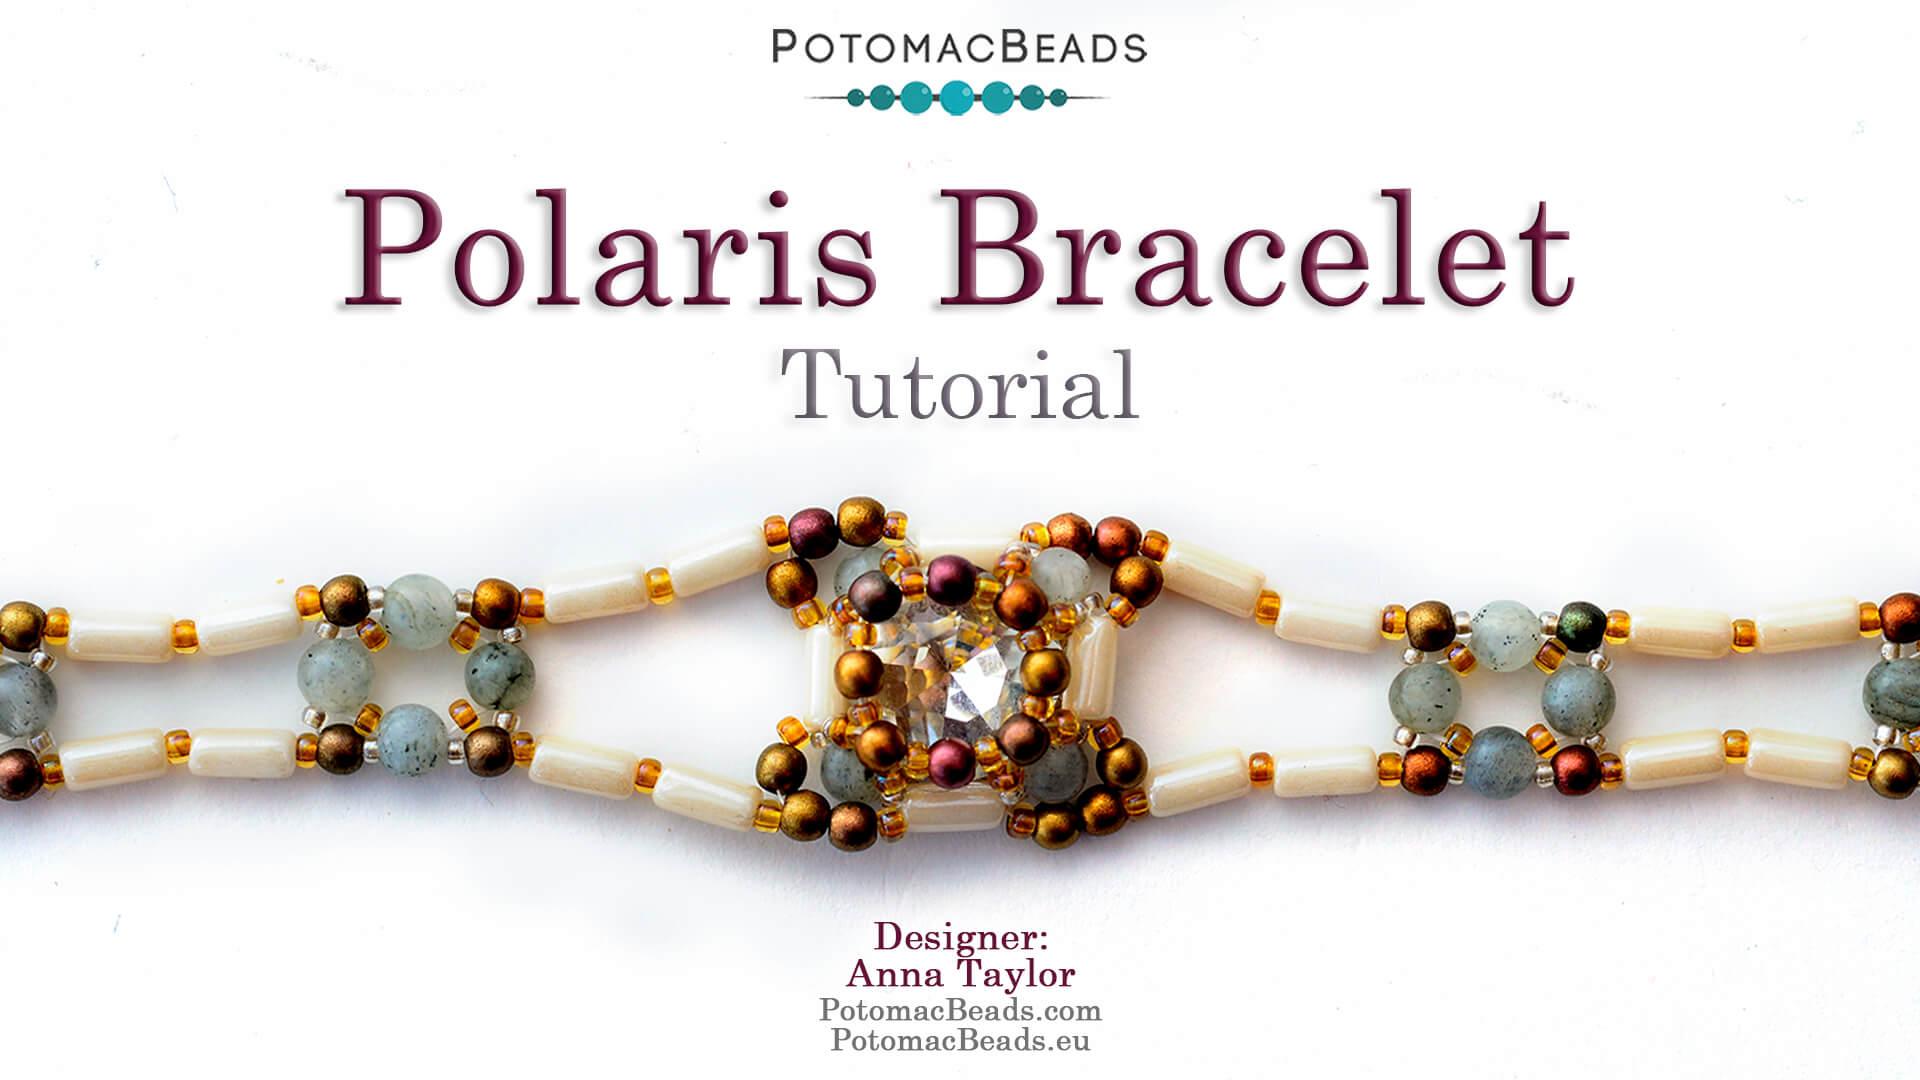 How to Bead / Videos Sorted by Beads / Potomac Crystal Videos / Polaris Bracelet Tutorial